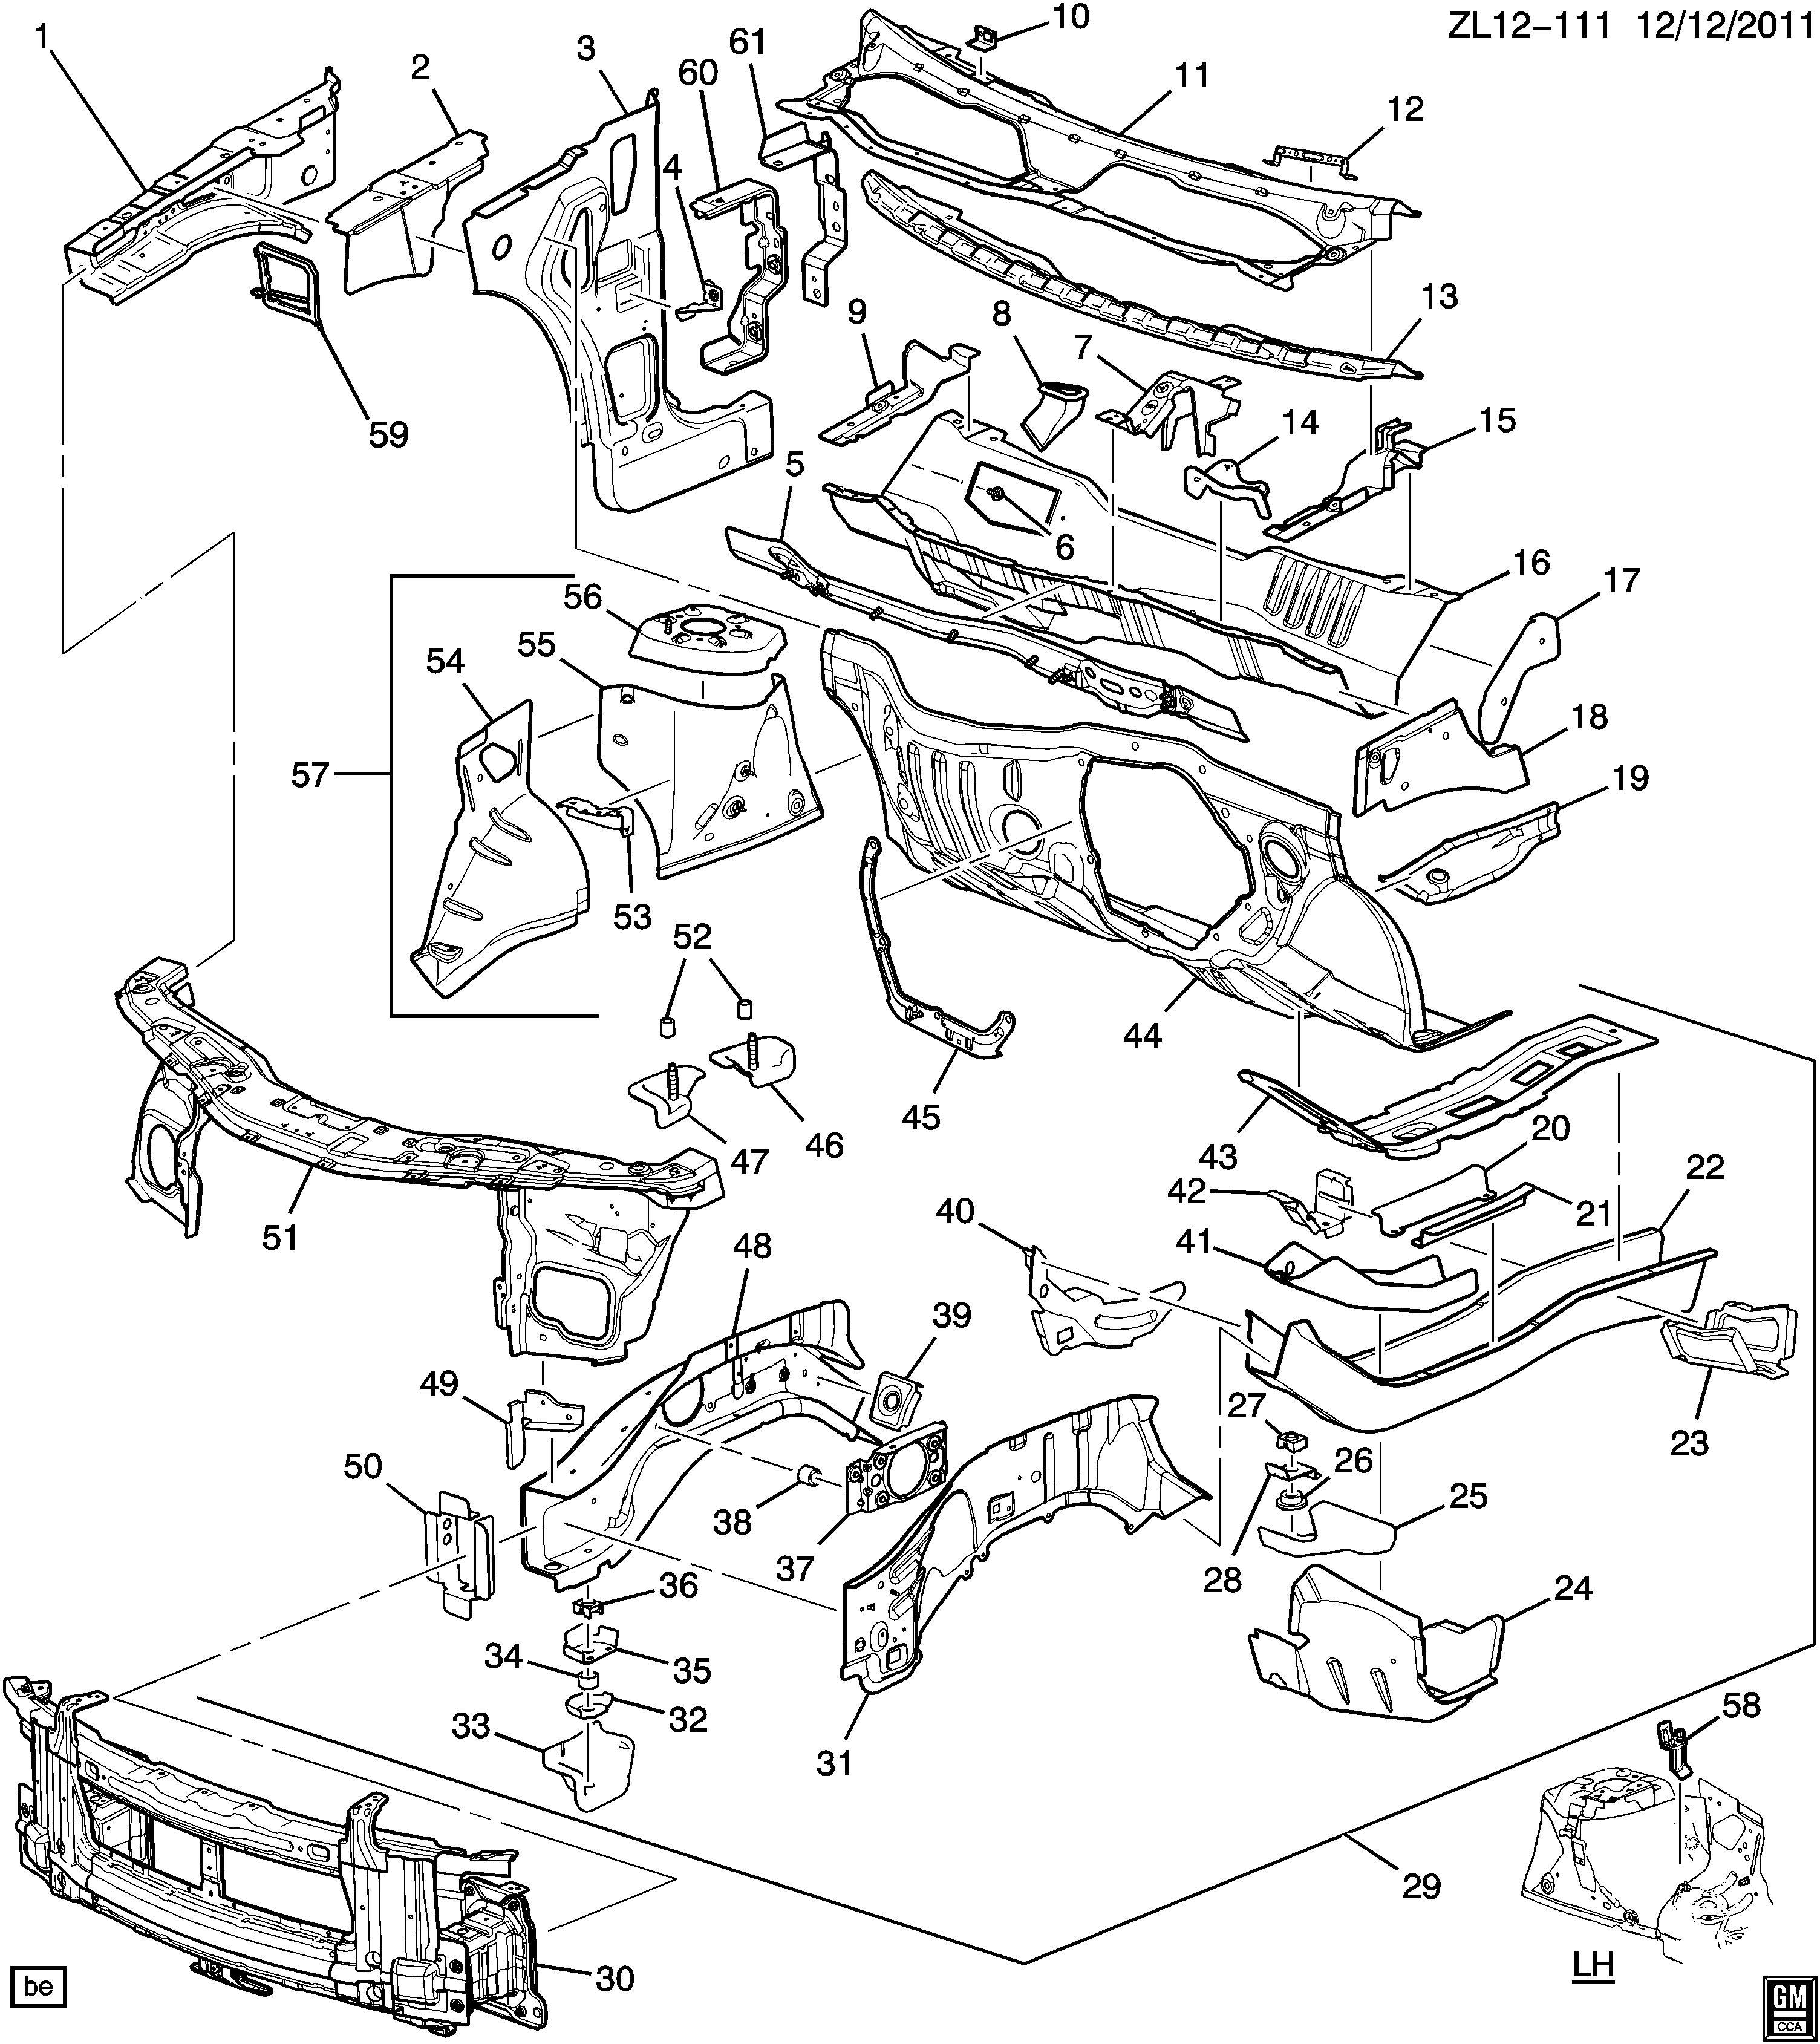 Chevrolet Captiva SHEET METAL/BODY-ENGINE COMPARTMENT & DASH